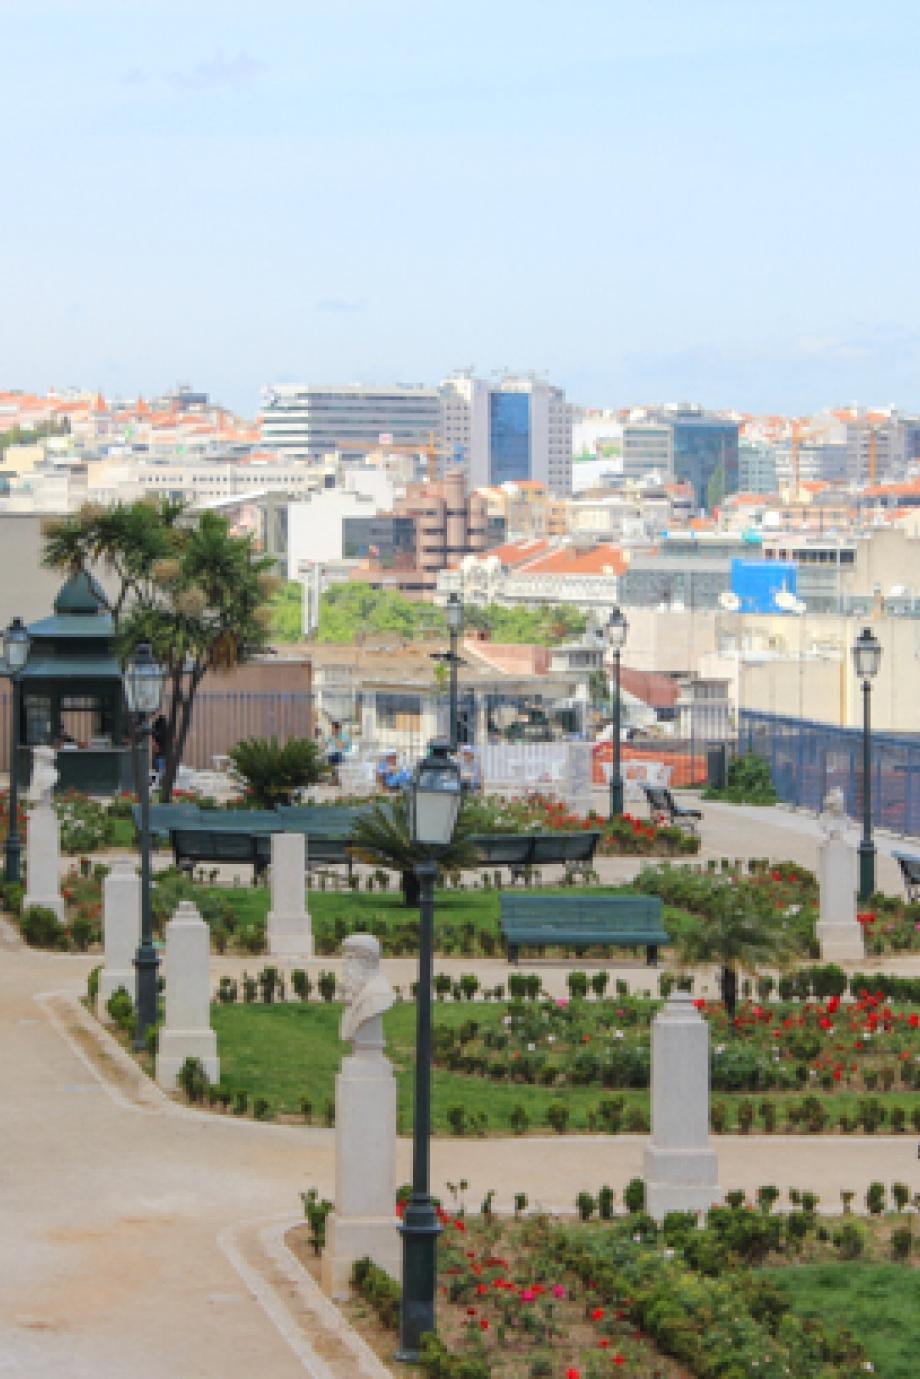 LisboaCool_Visitar_Miradouro de São Pedro de Alcântara